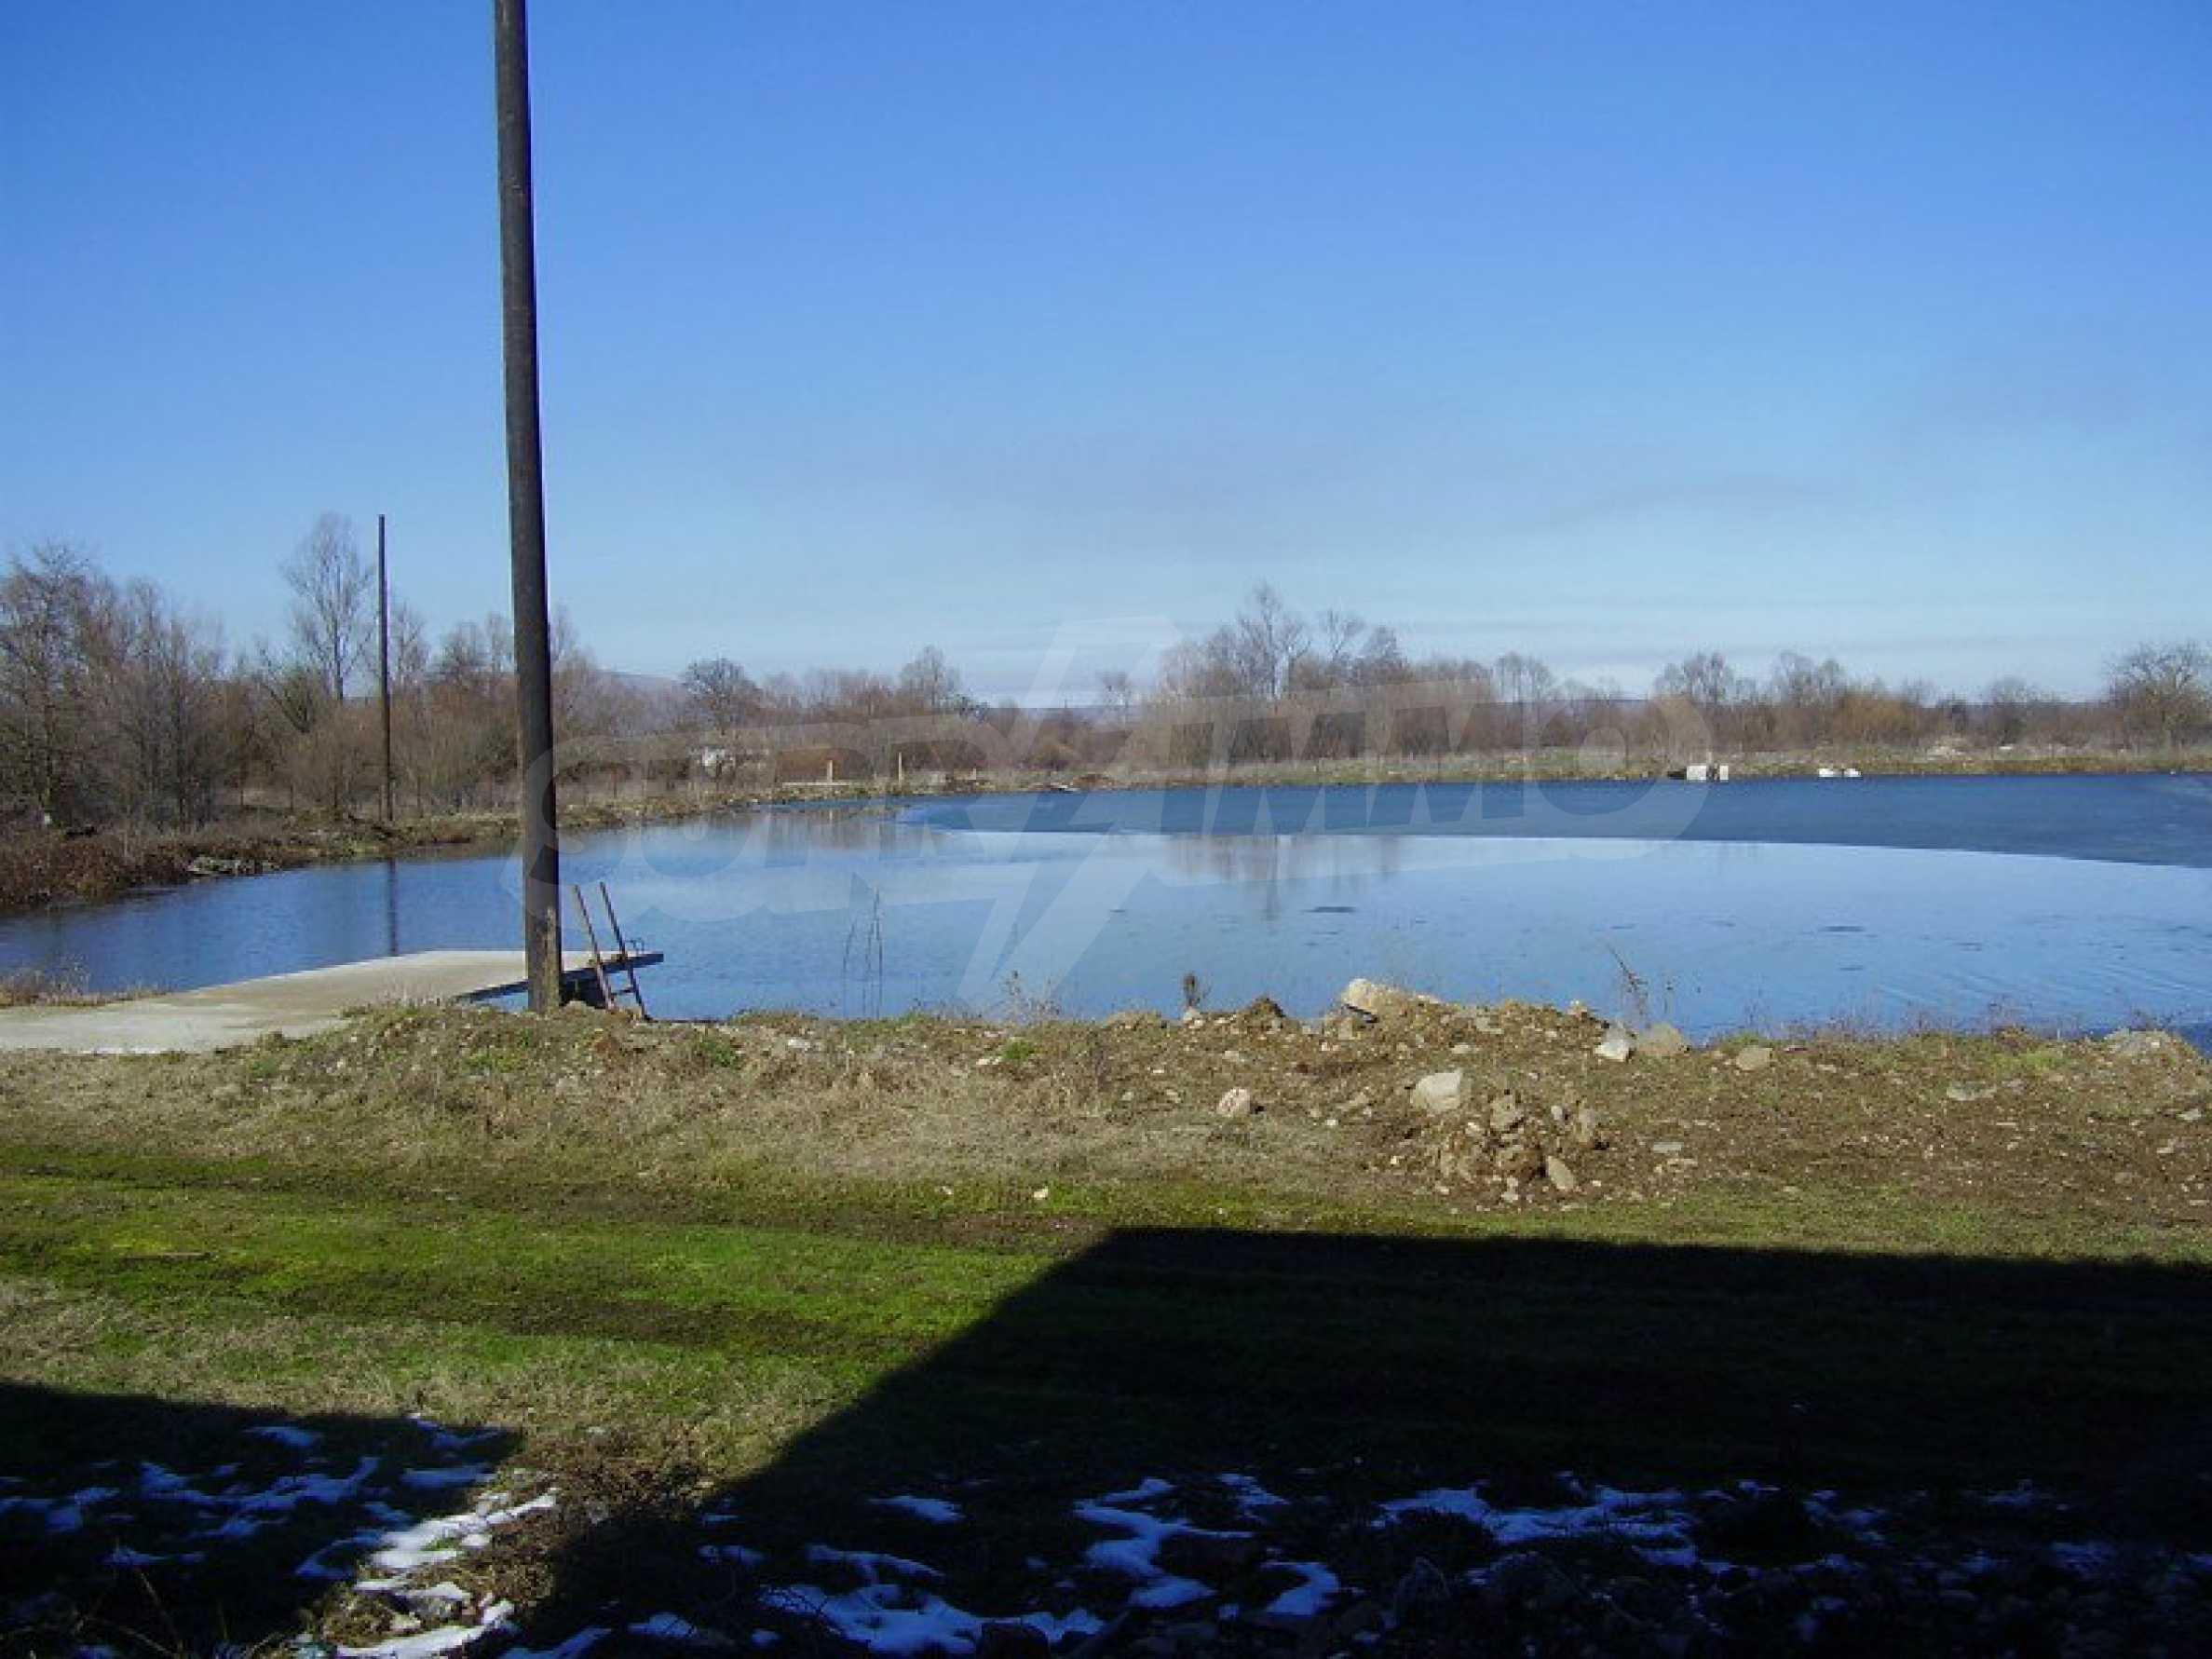 Fishpond, warehouses, residential areas and asphalt ground near Montana 19